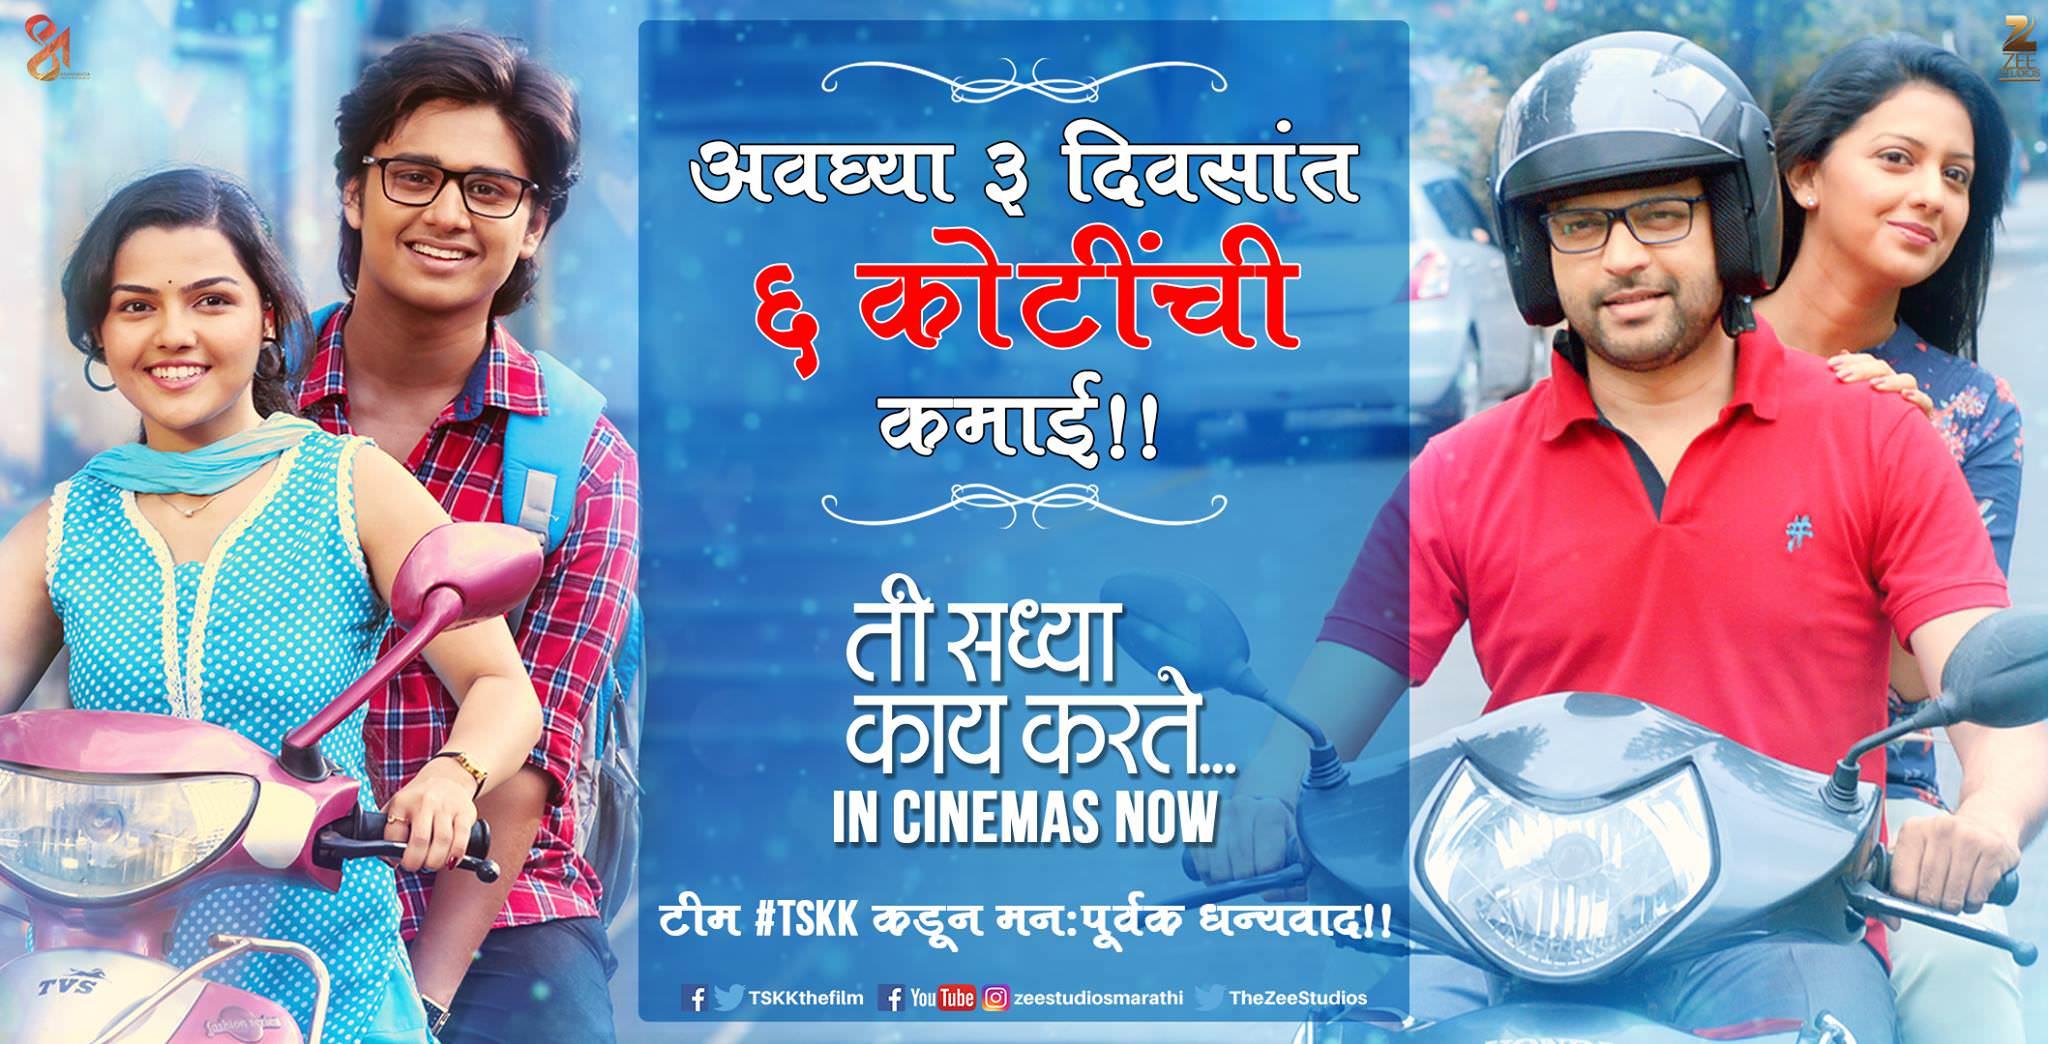 Ti Saddhya Kay Karte Box office Collection - Marathi Movie